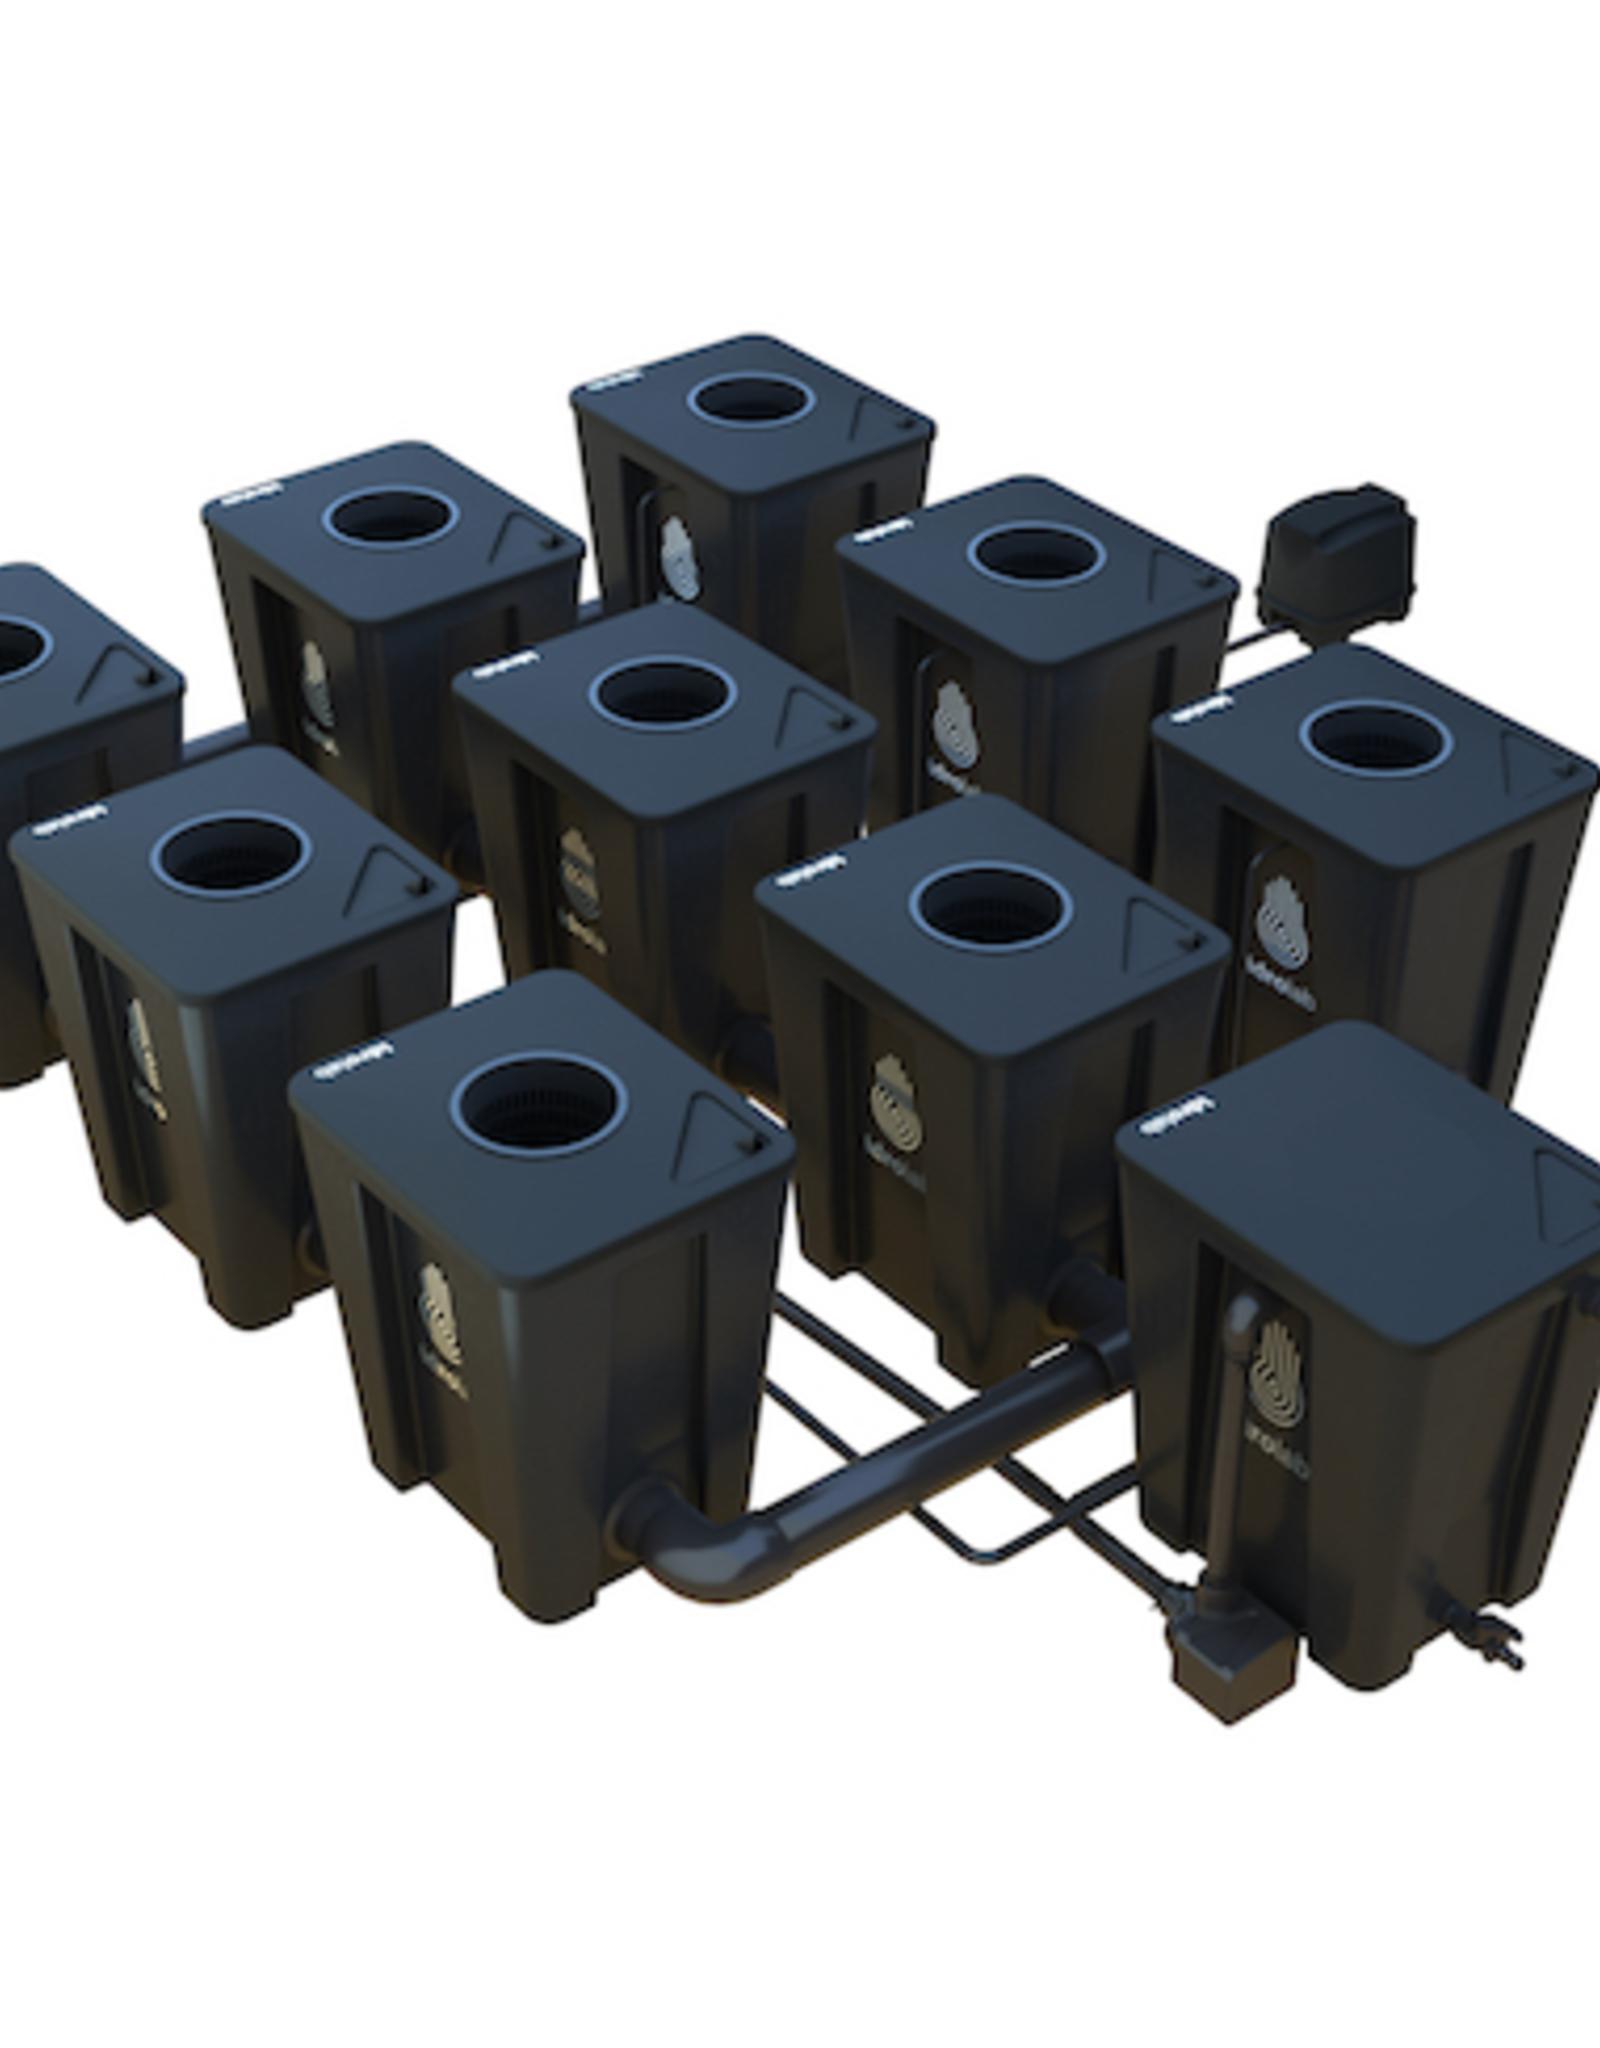 IDROLAB IDROLAB RDWC SYSTEM 3 ORIGINAL 9+1